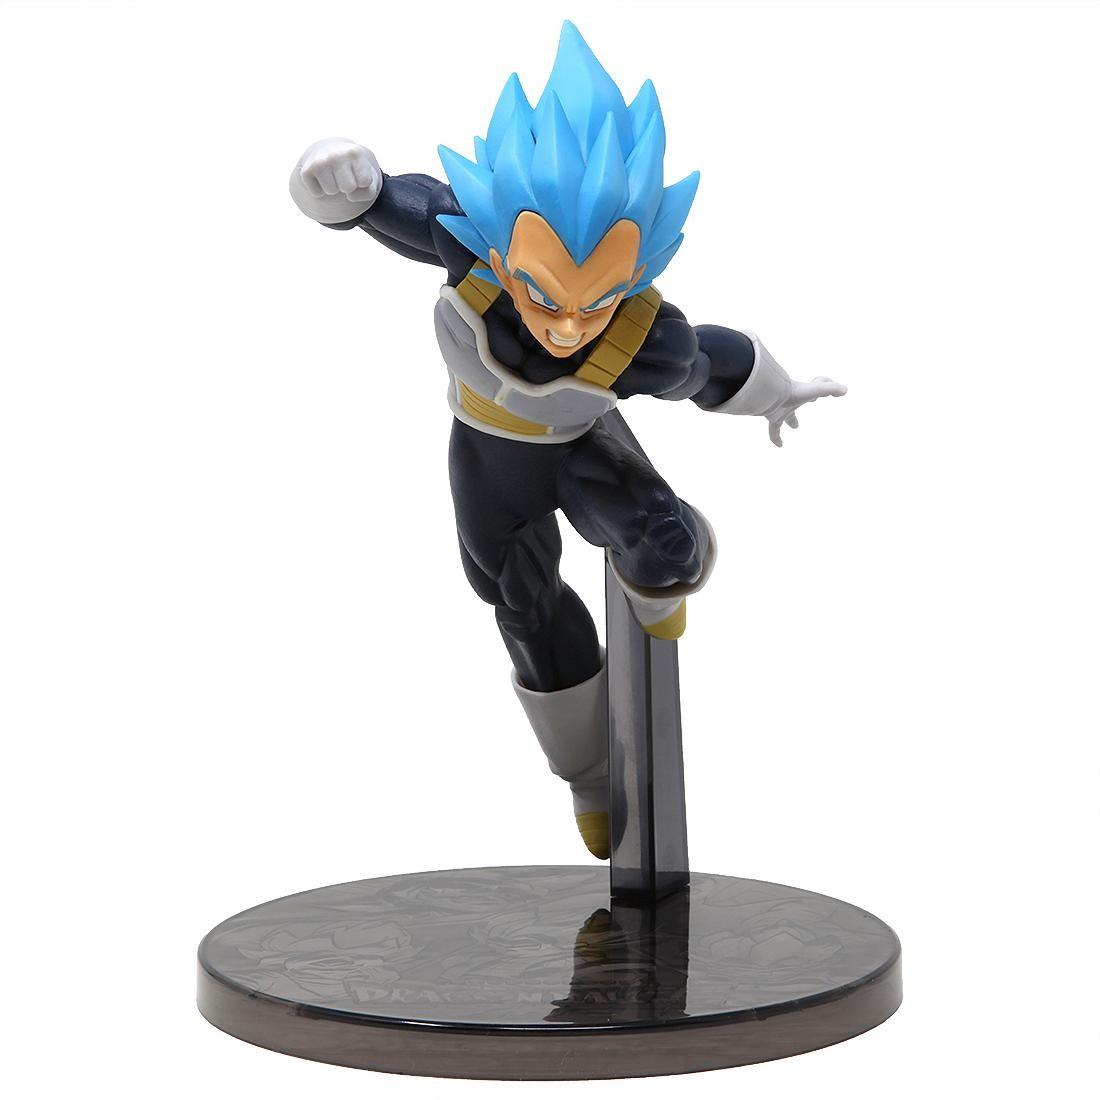 Banpresto Dragon Ball Super The Movie Ultimate Soldiers The Movie Vol 3 Super Saiyan Blue Vegeta Figure (blue)